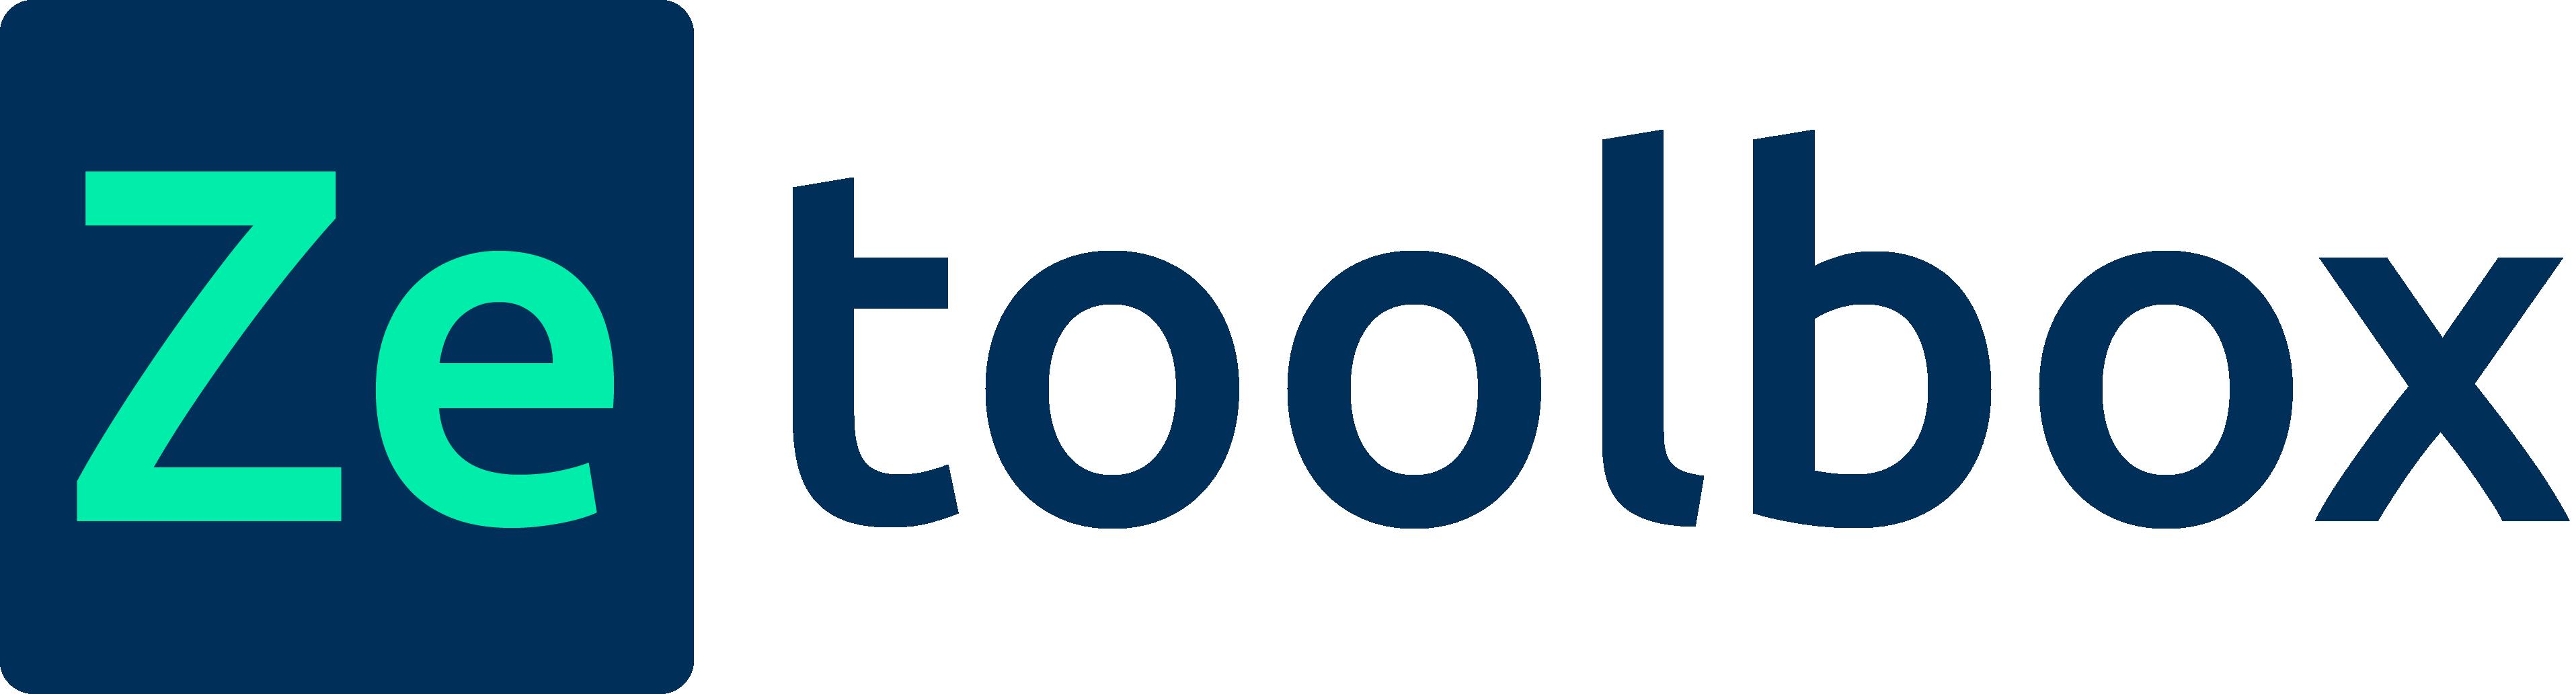 Logo Zetoolbox